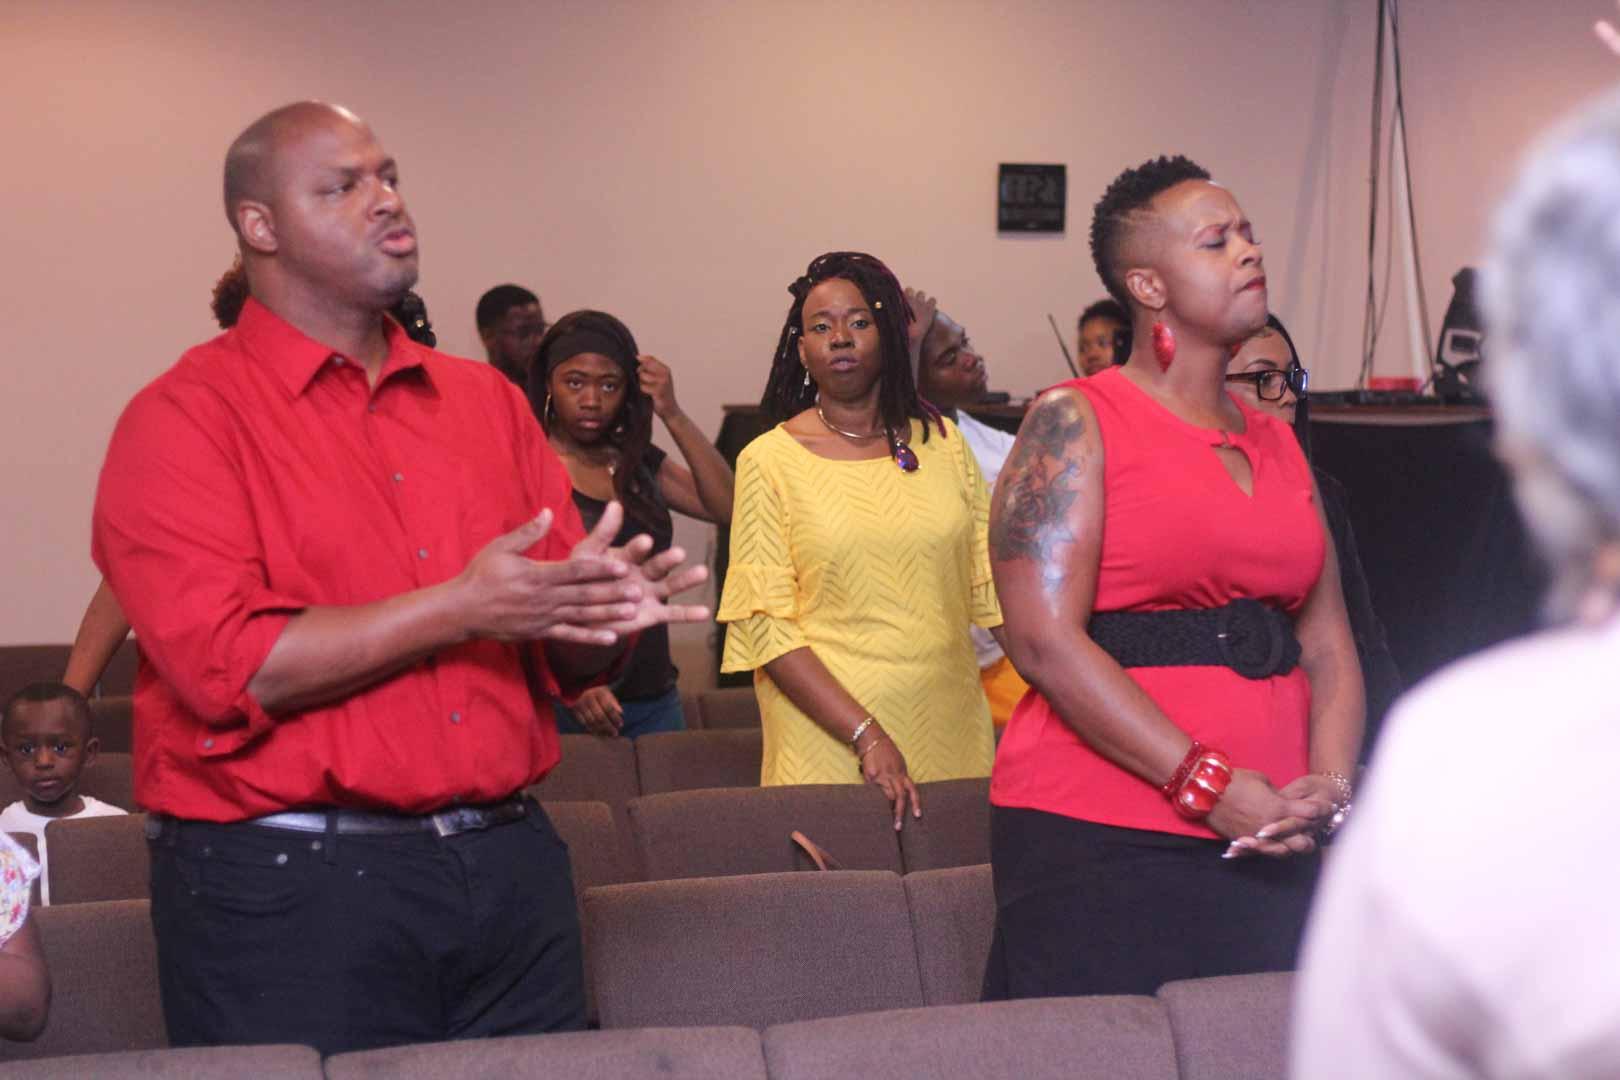 fathershouse-kingdom-ministries-church-in-jacksonville-florida0032